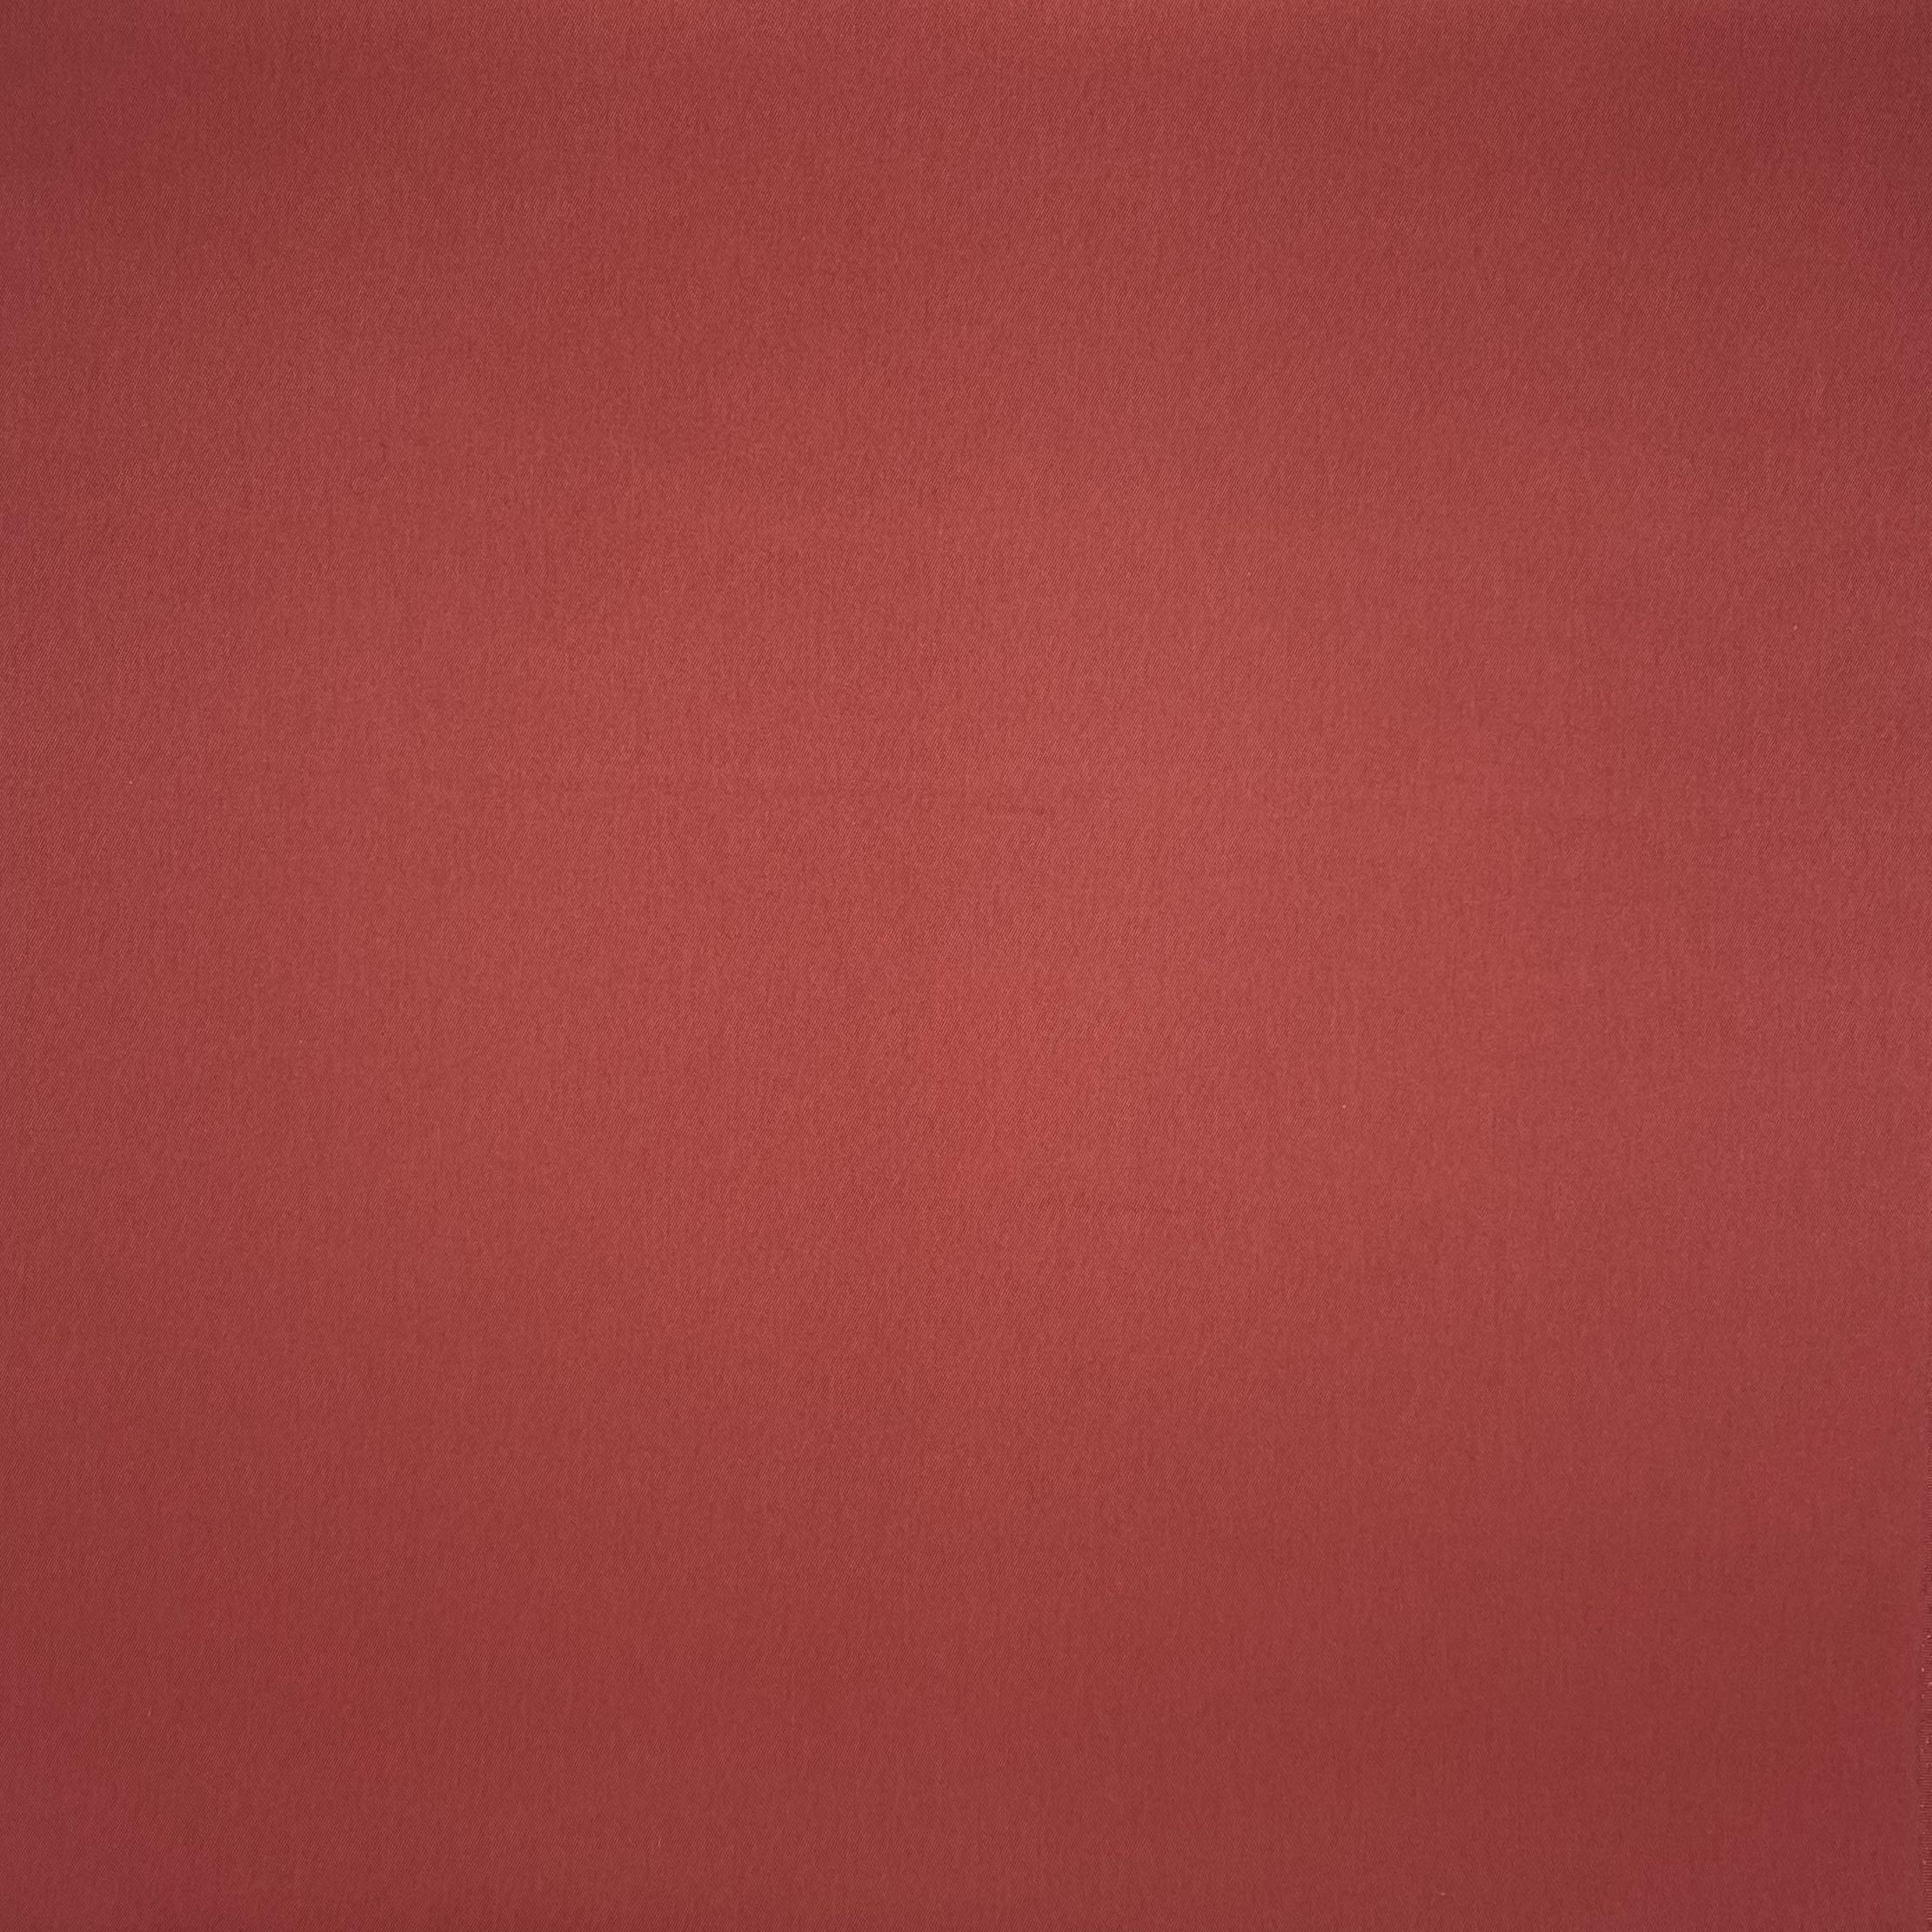 Cotton-Shakespear-Pink-2284